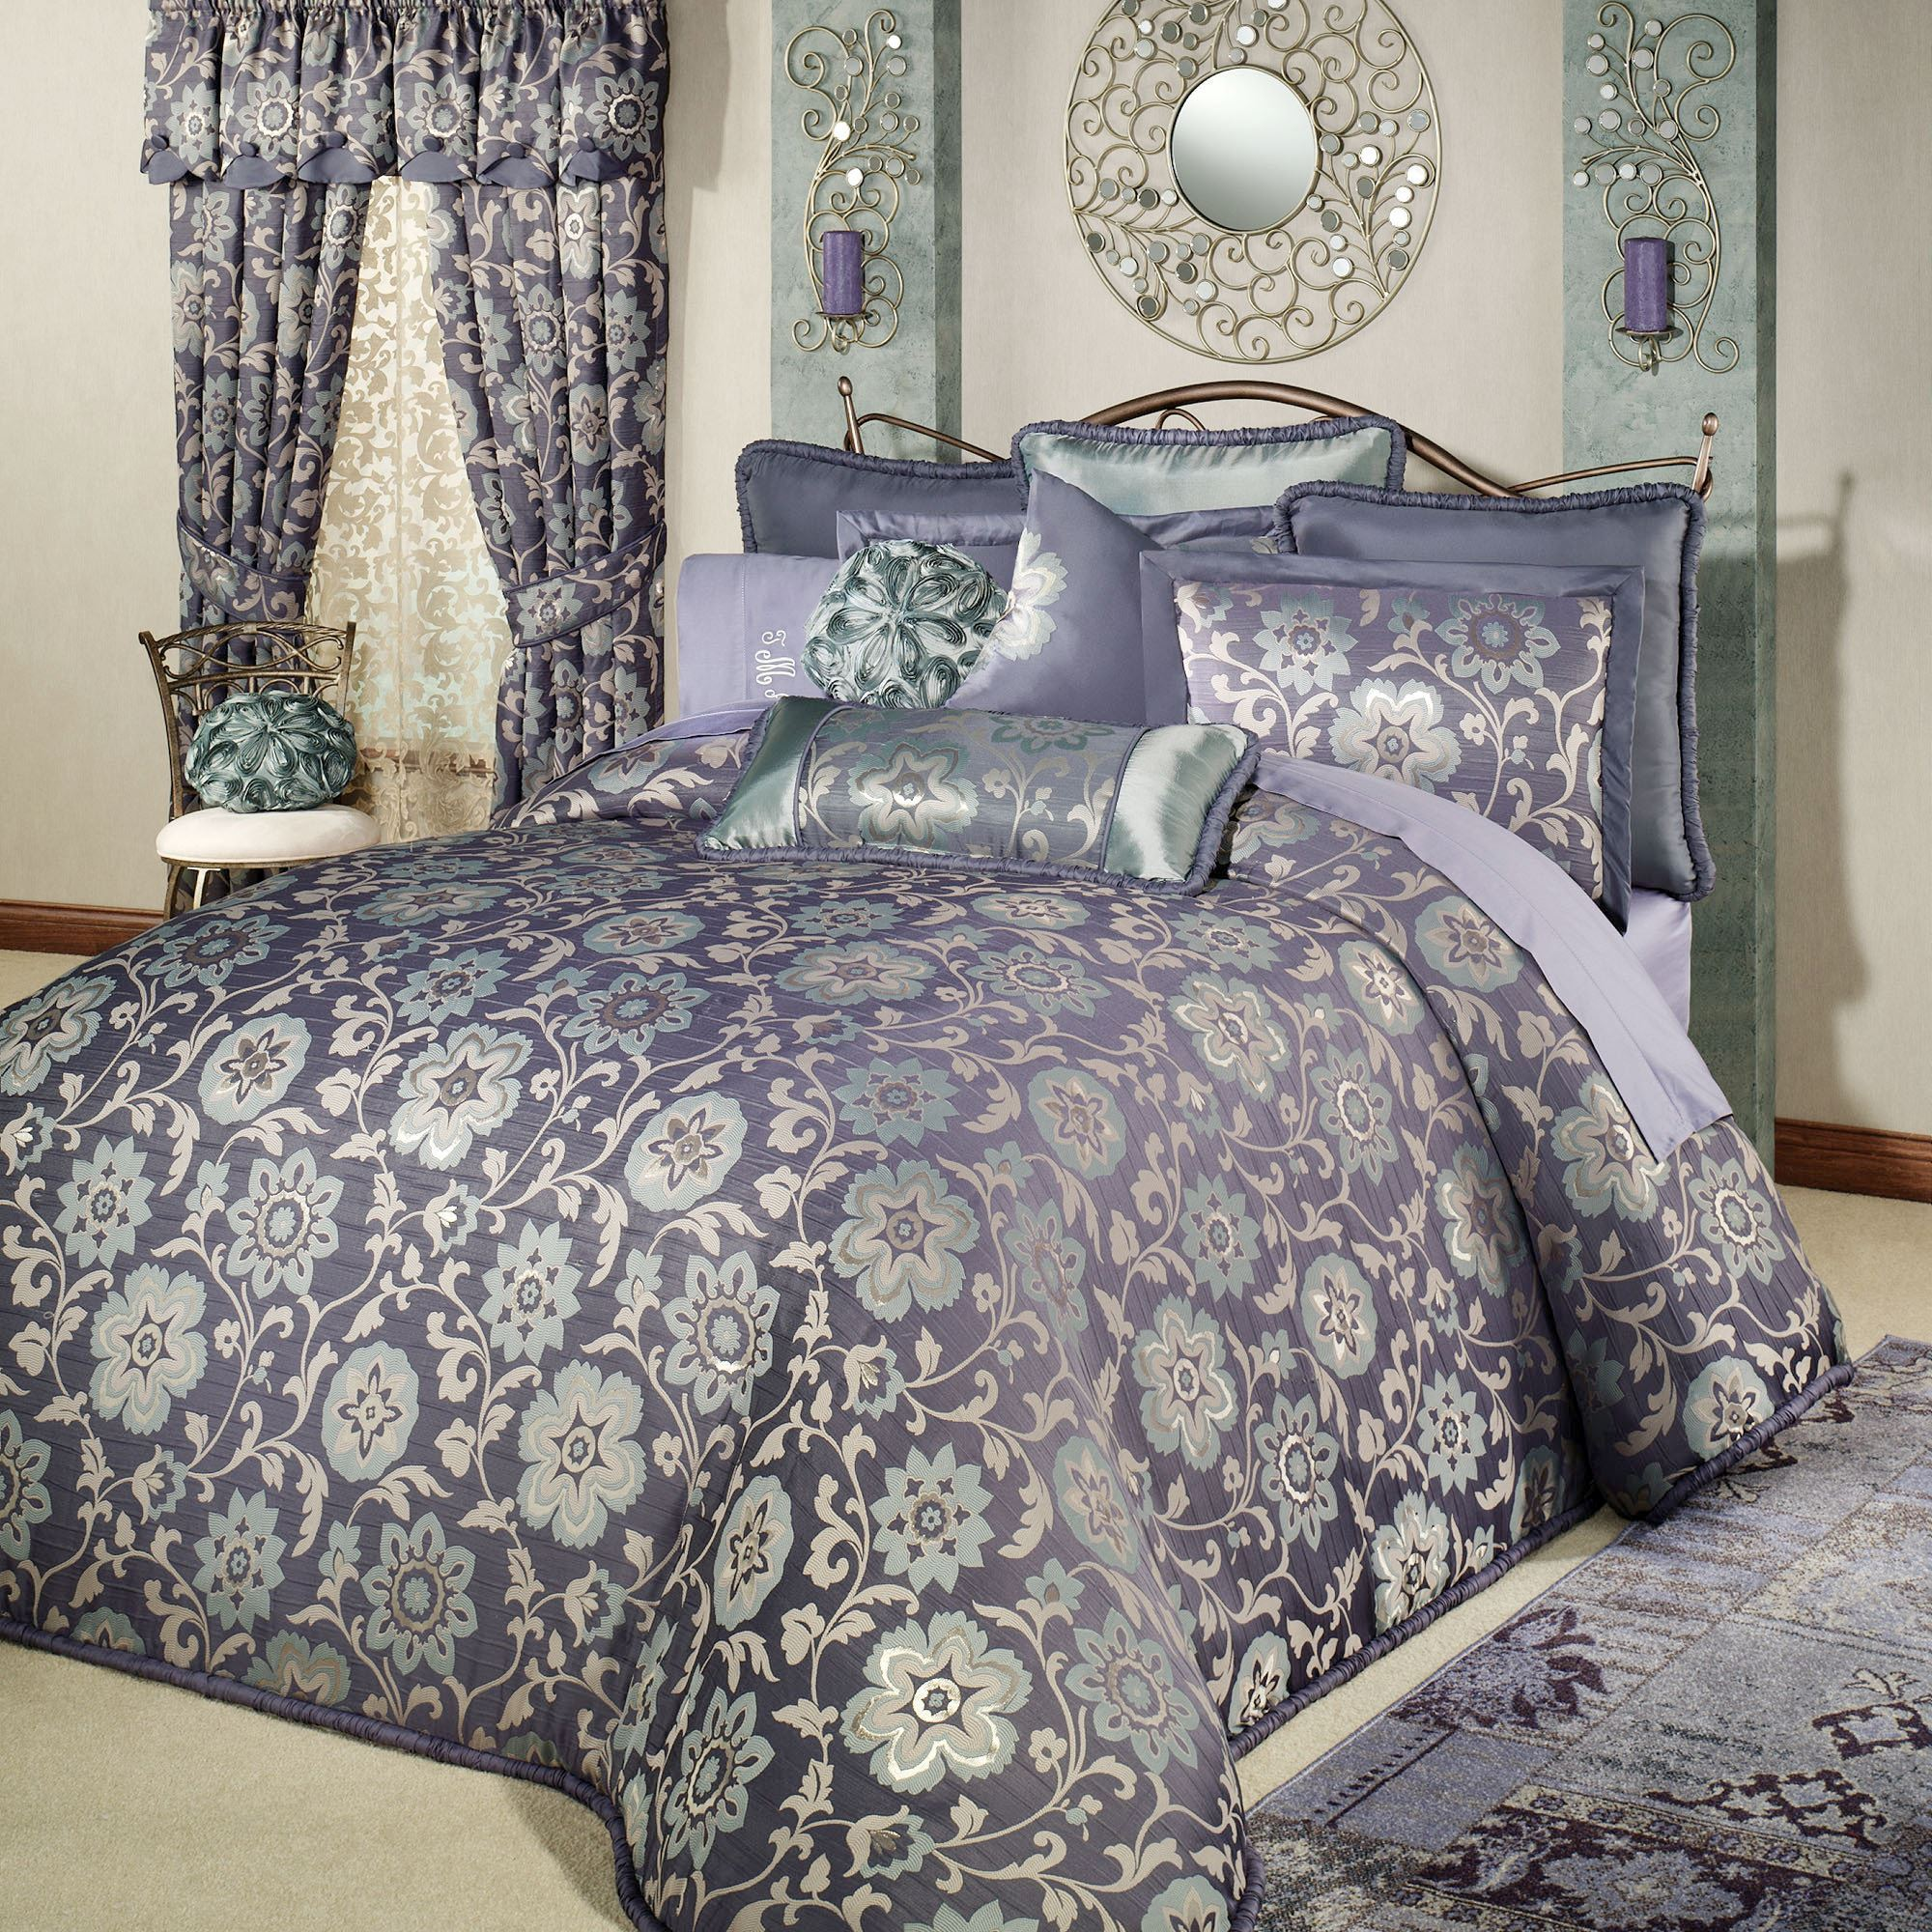 Oversized King Bedding 120 Bedding Designs